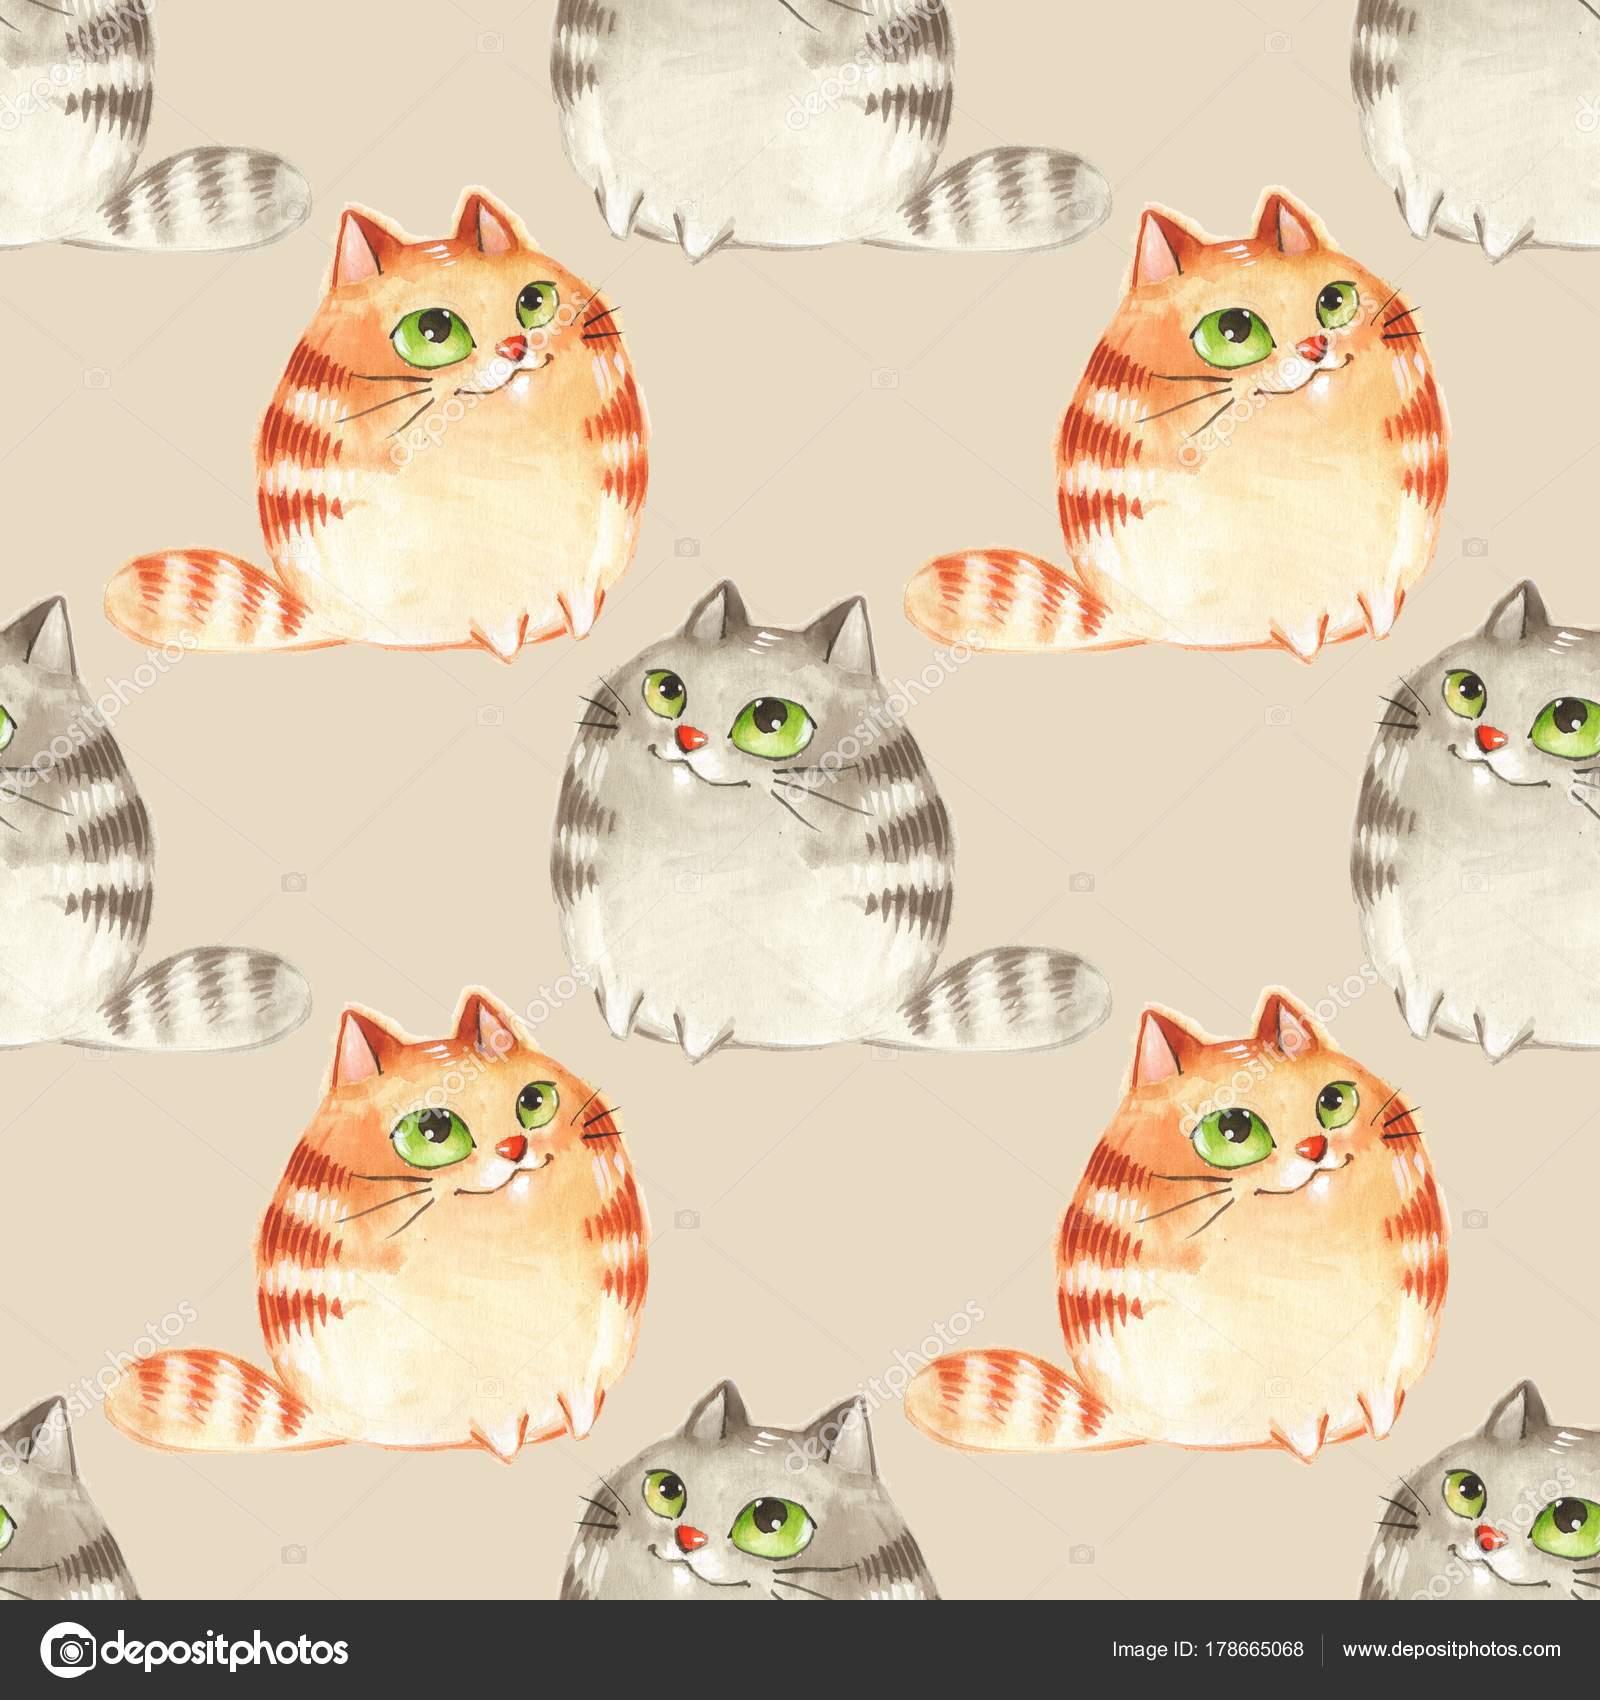 Gatos de dibujos animados acuarela, patrón transparente 6 — Fotos de ...